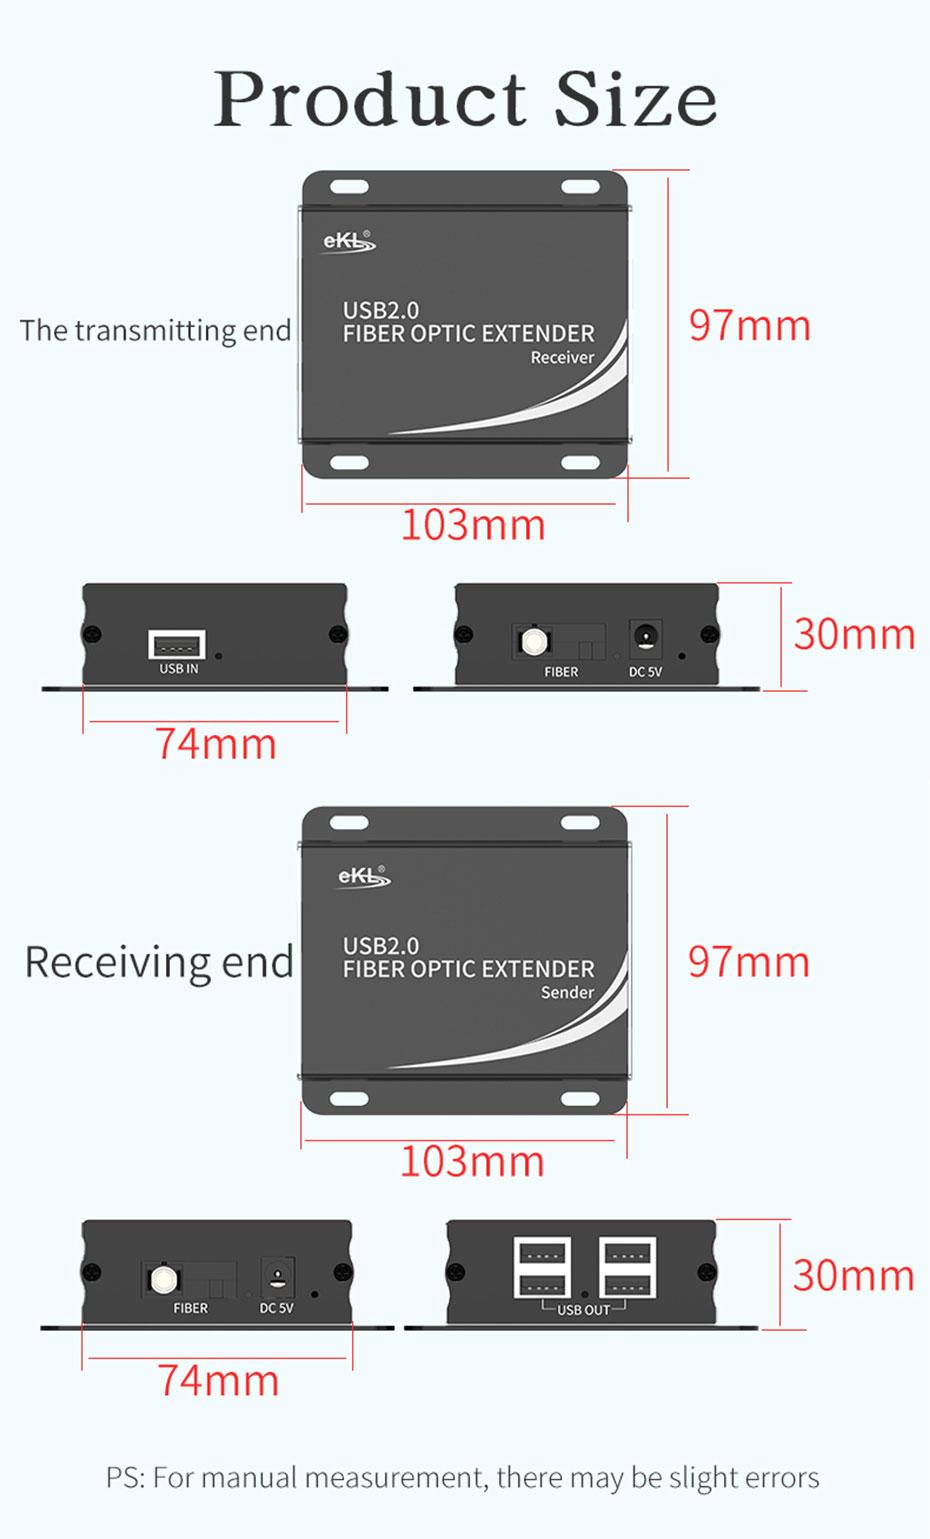 USB fiber optic extender UF01 size